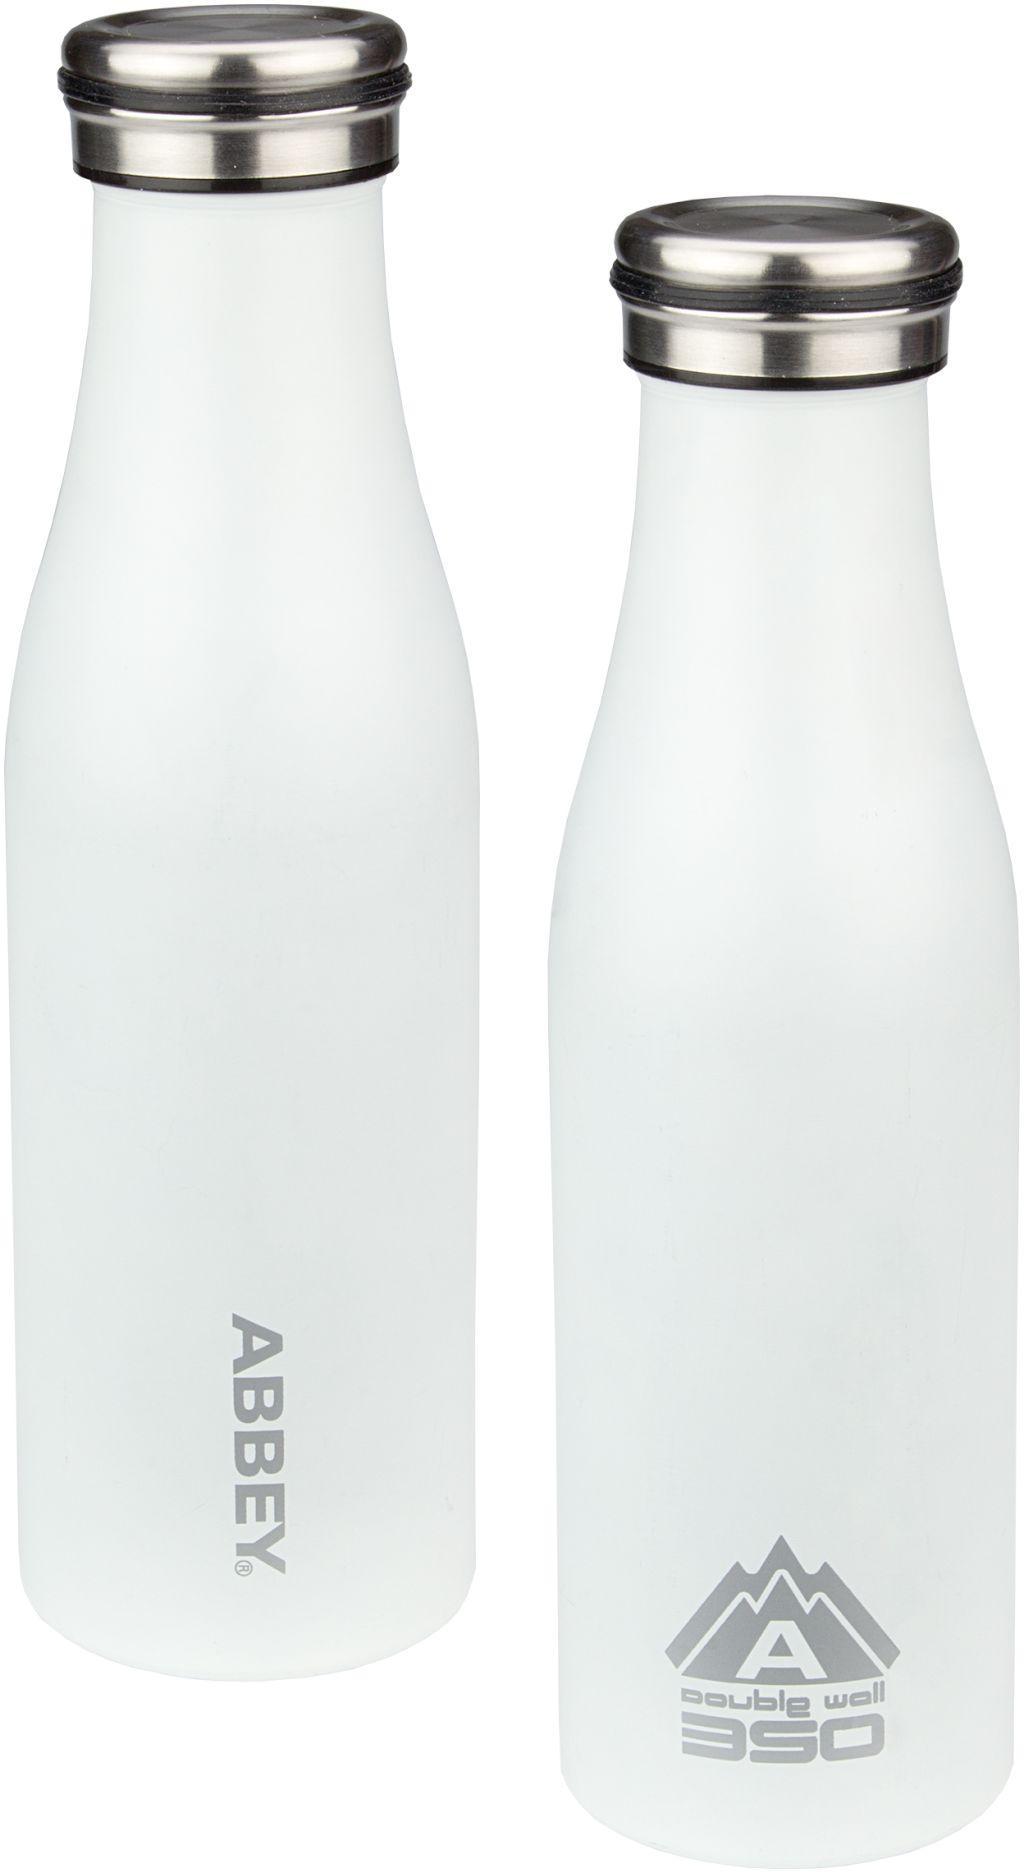 Drinkfles Dubbelwandig Victoria • 0.45 Liter •